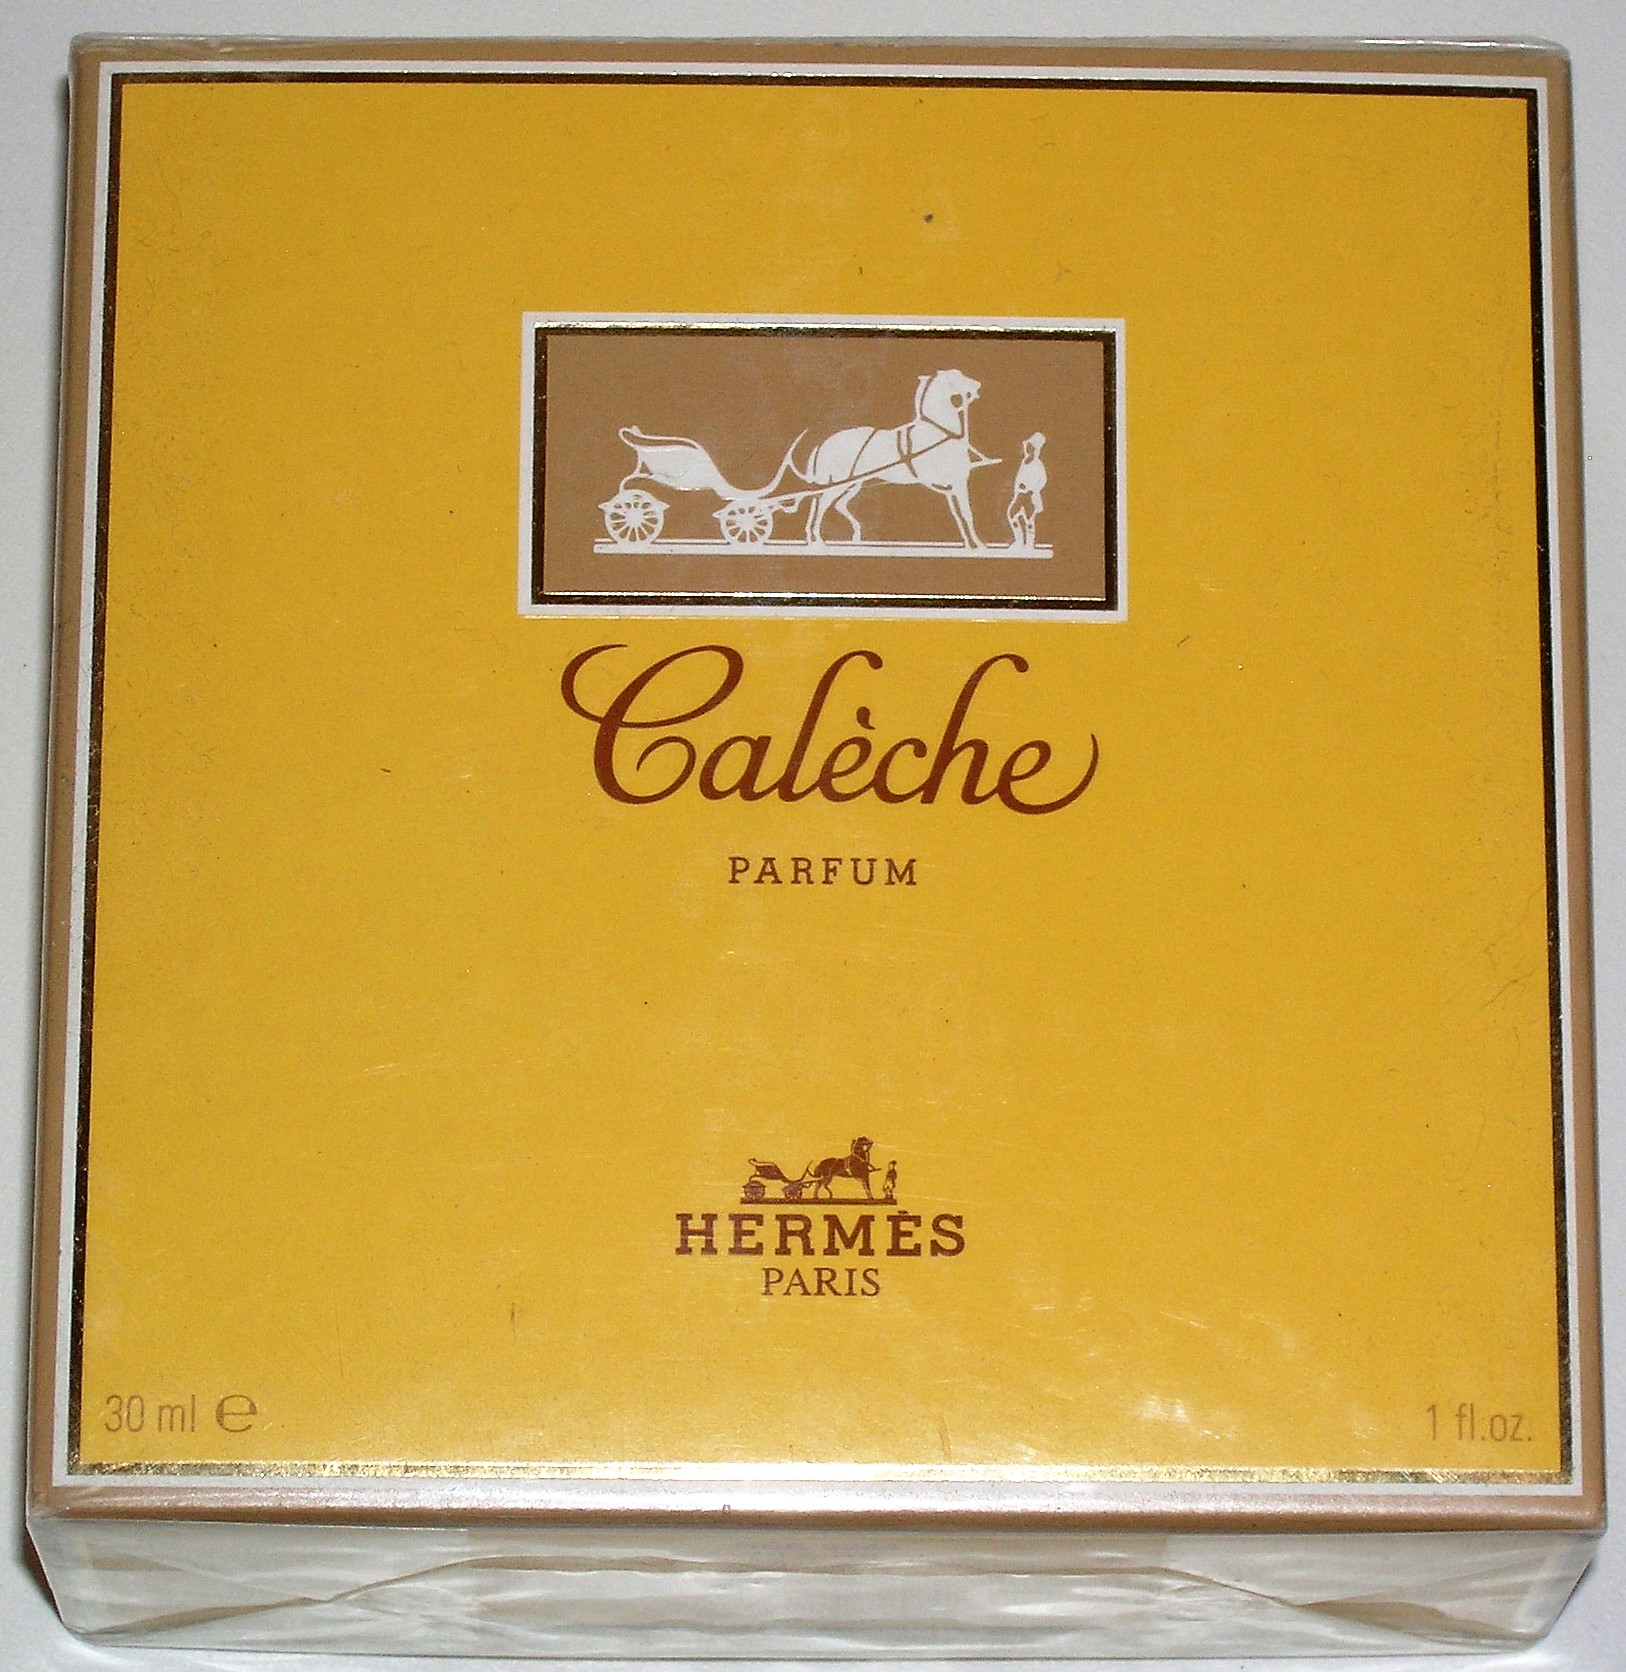 Ml Fl Caleche Hermes Oz 1 30 Parfum doxCeBr